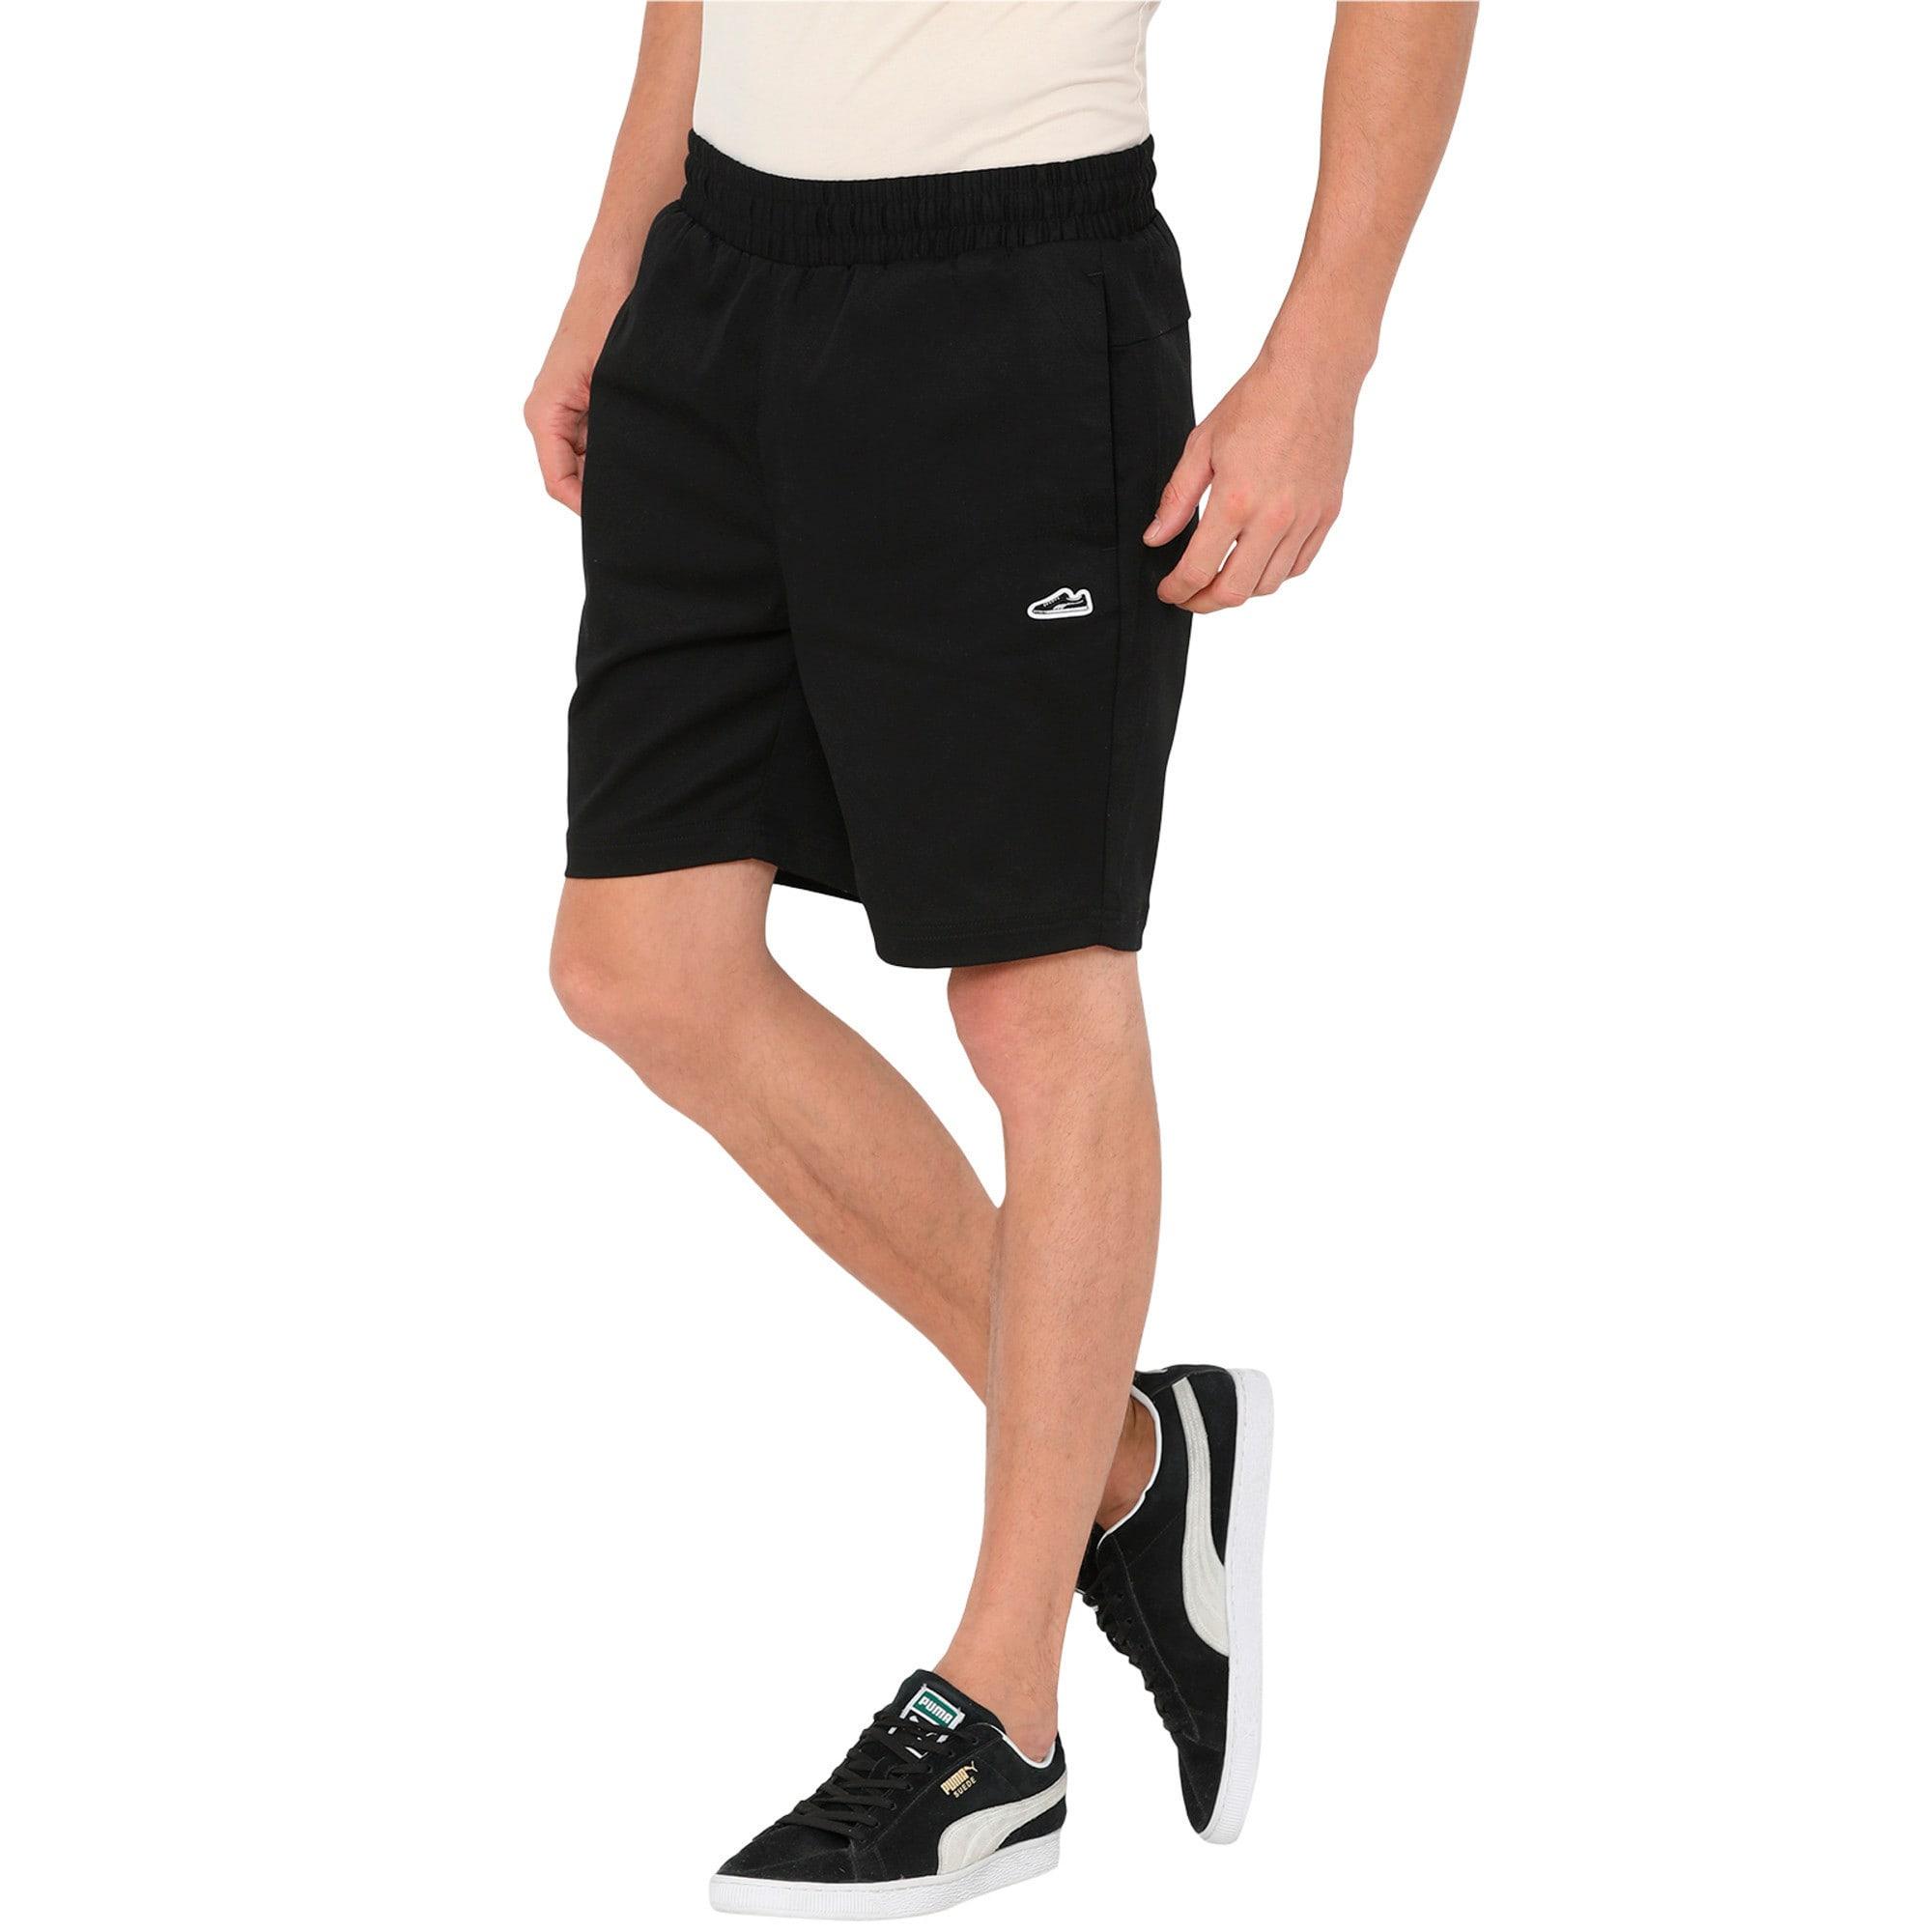 Thumbnail 2 of Men's Suede Shorts, Puma Black, medium-IND